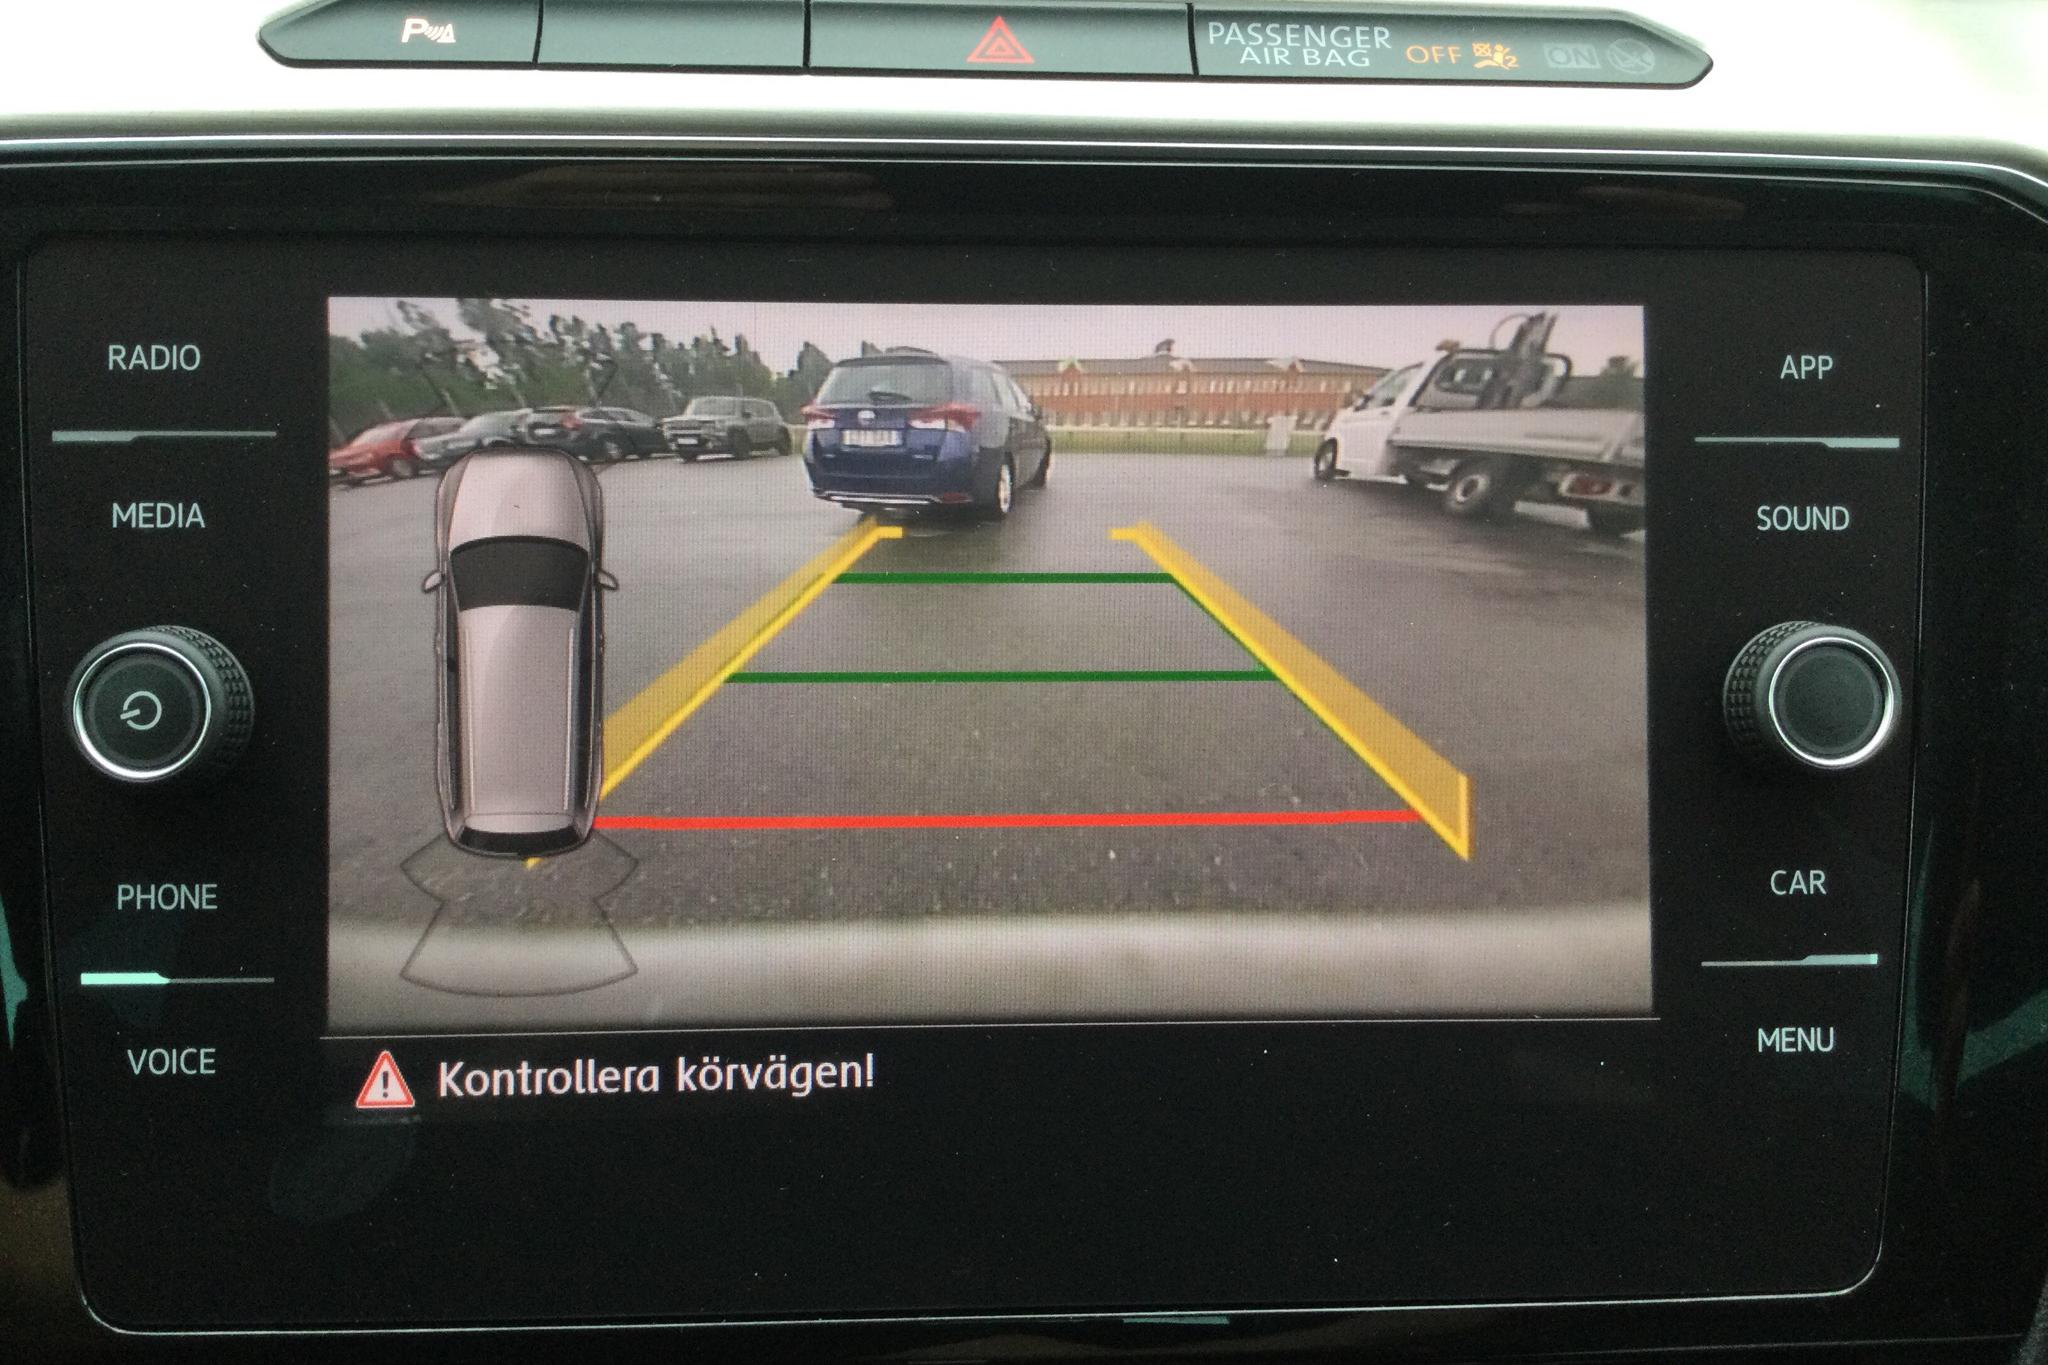 VW Passat Alltrack 2.0 TDI Sportscombi 4MOTION (190hk) - 10 552 mil - Automat - vit - 2018